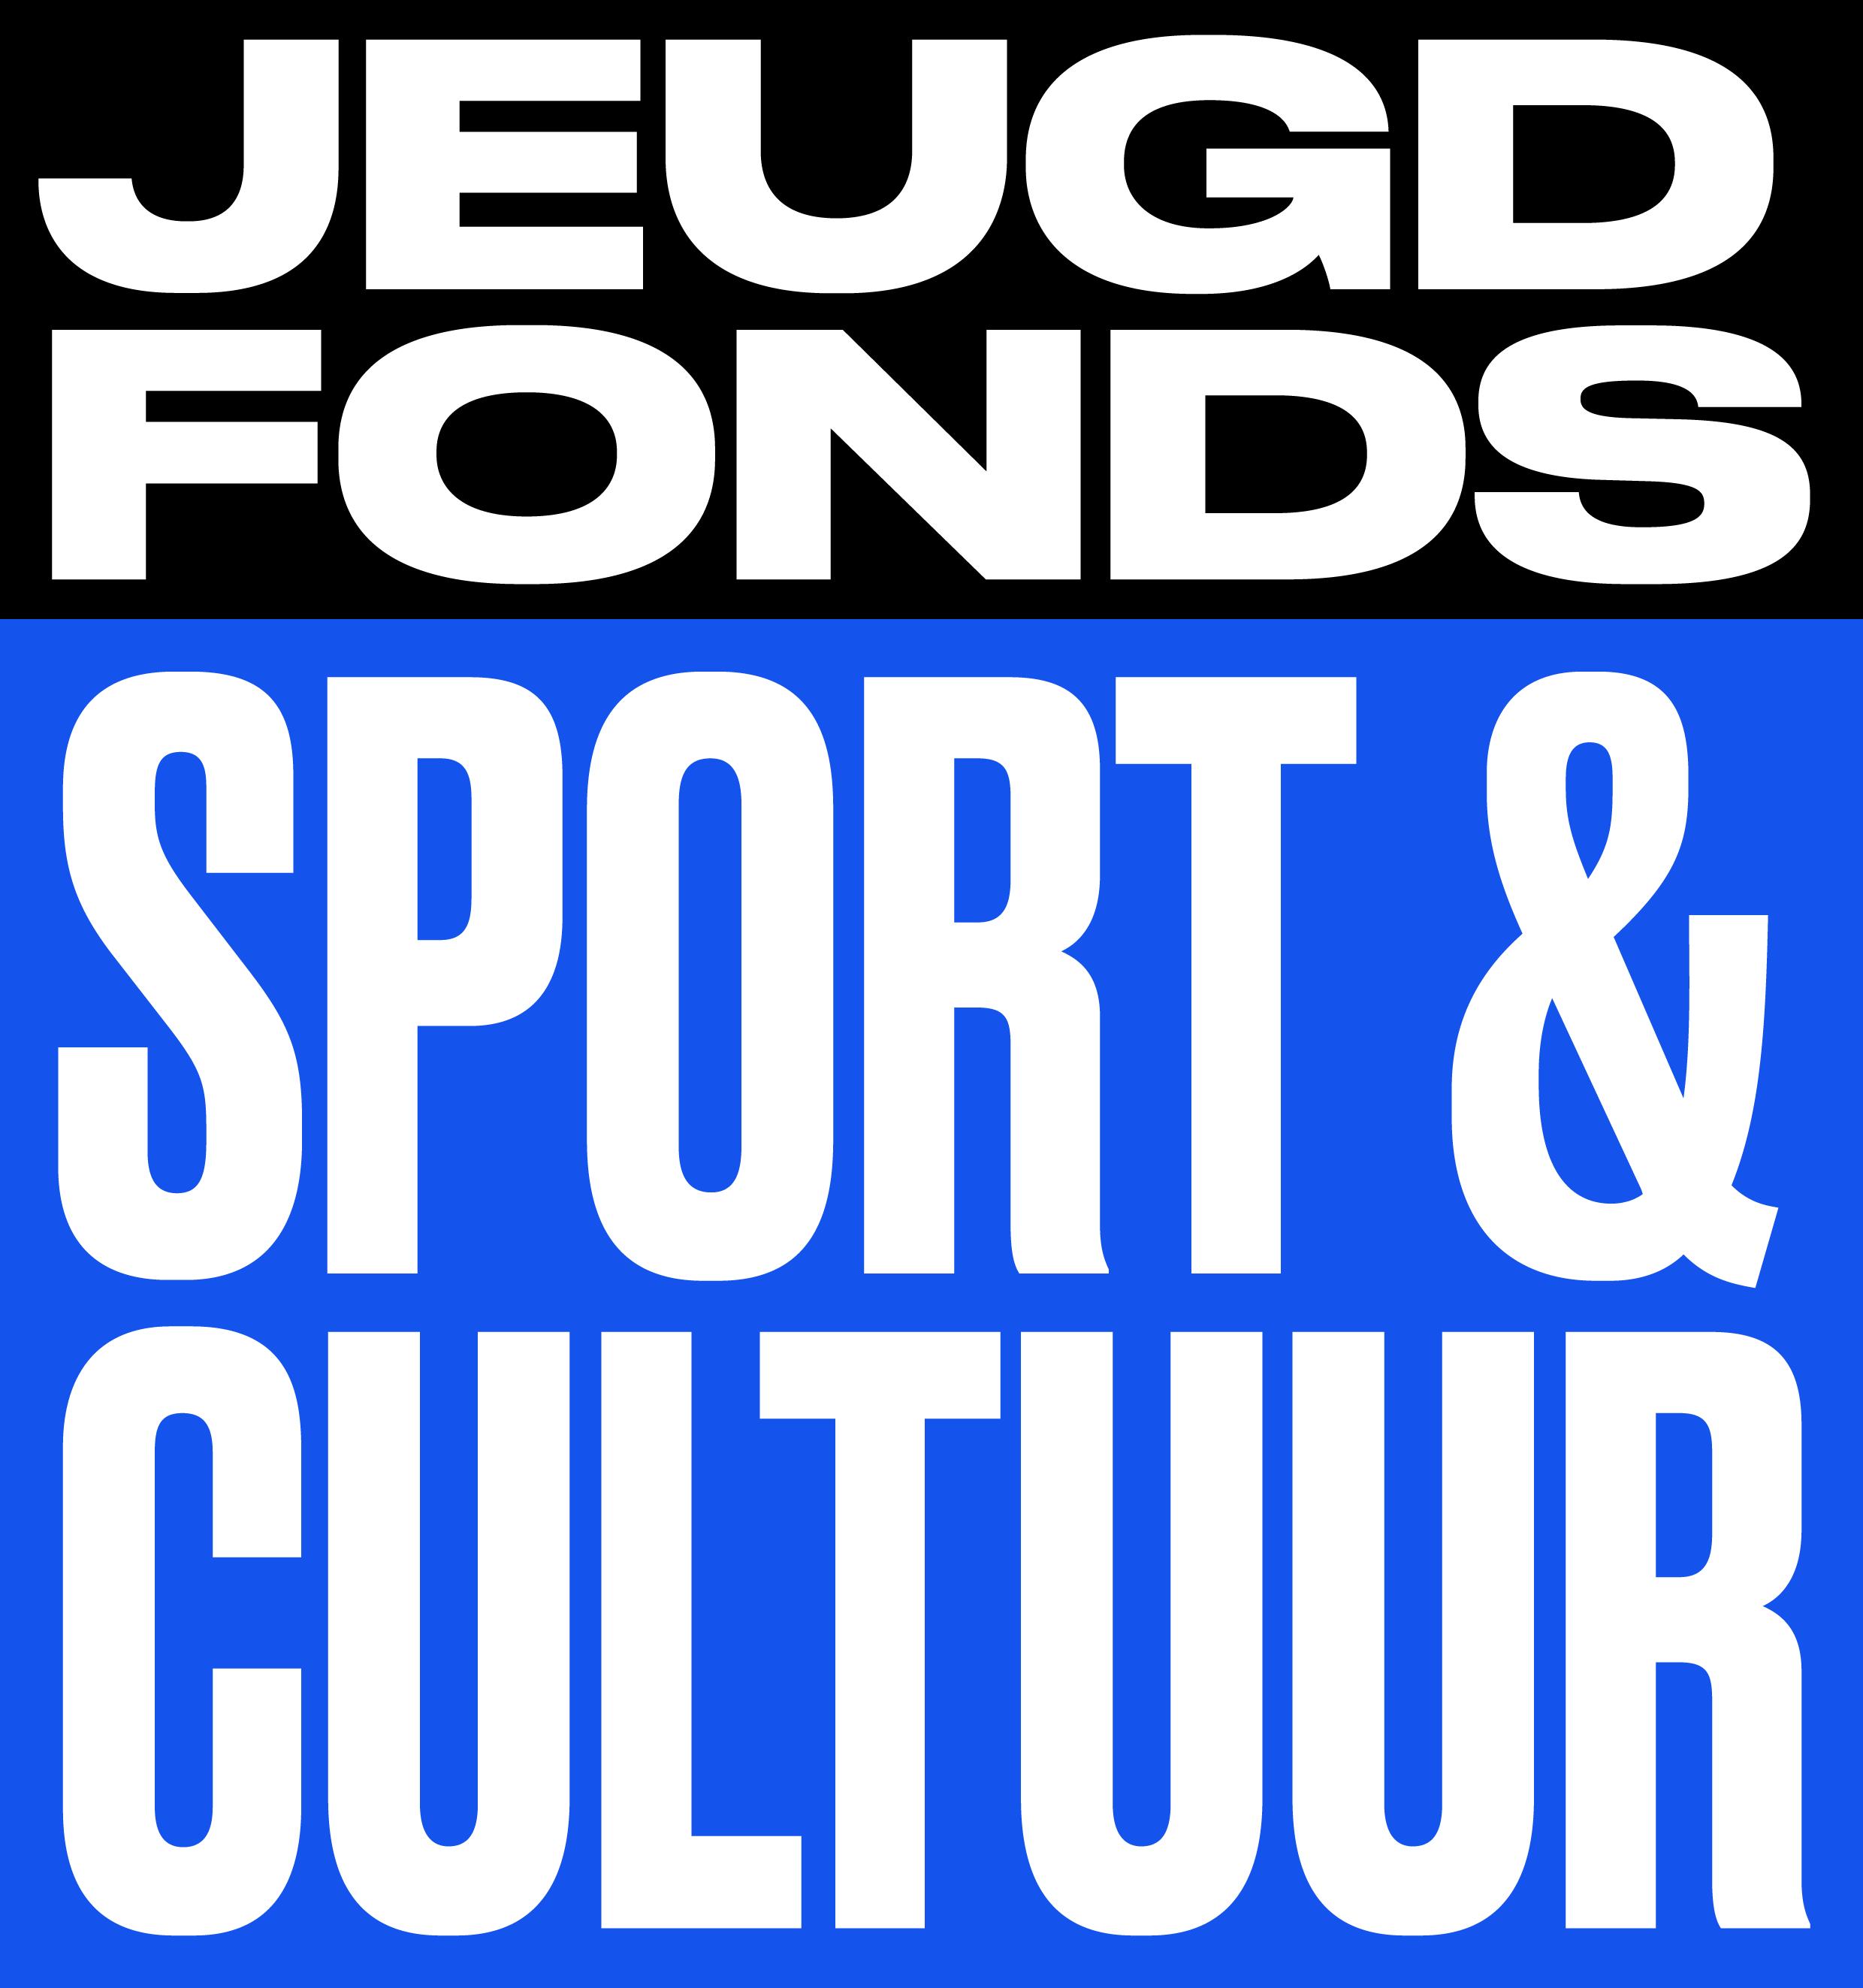 Jeugd Sport Fonds logo